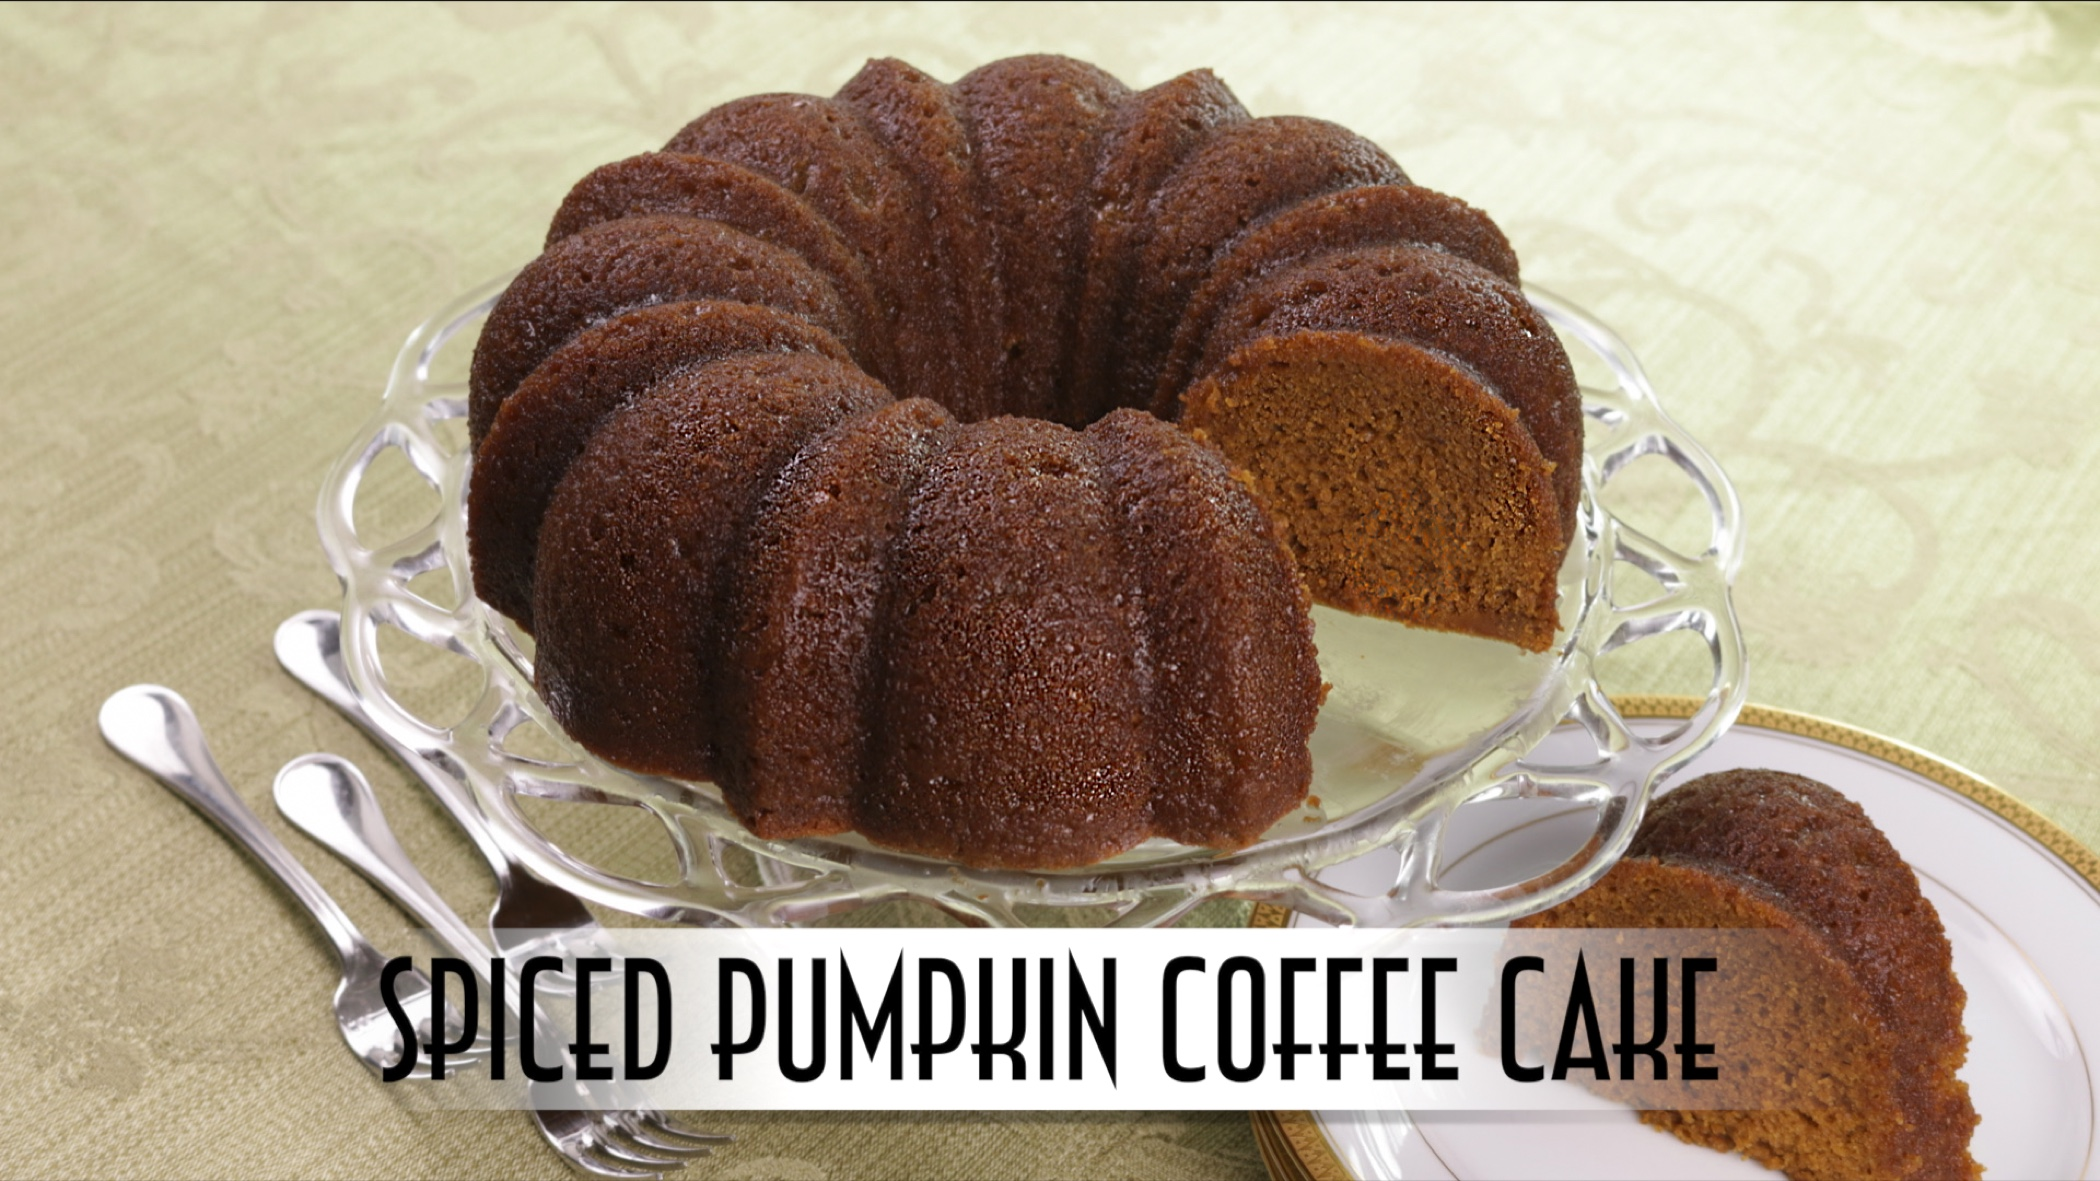 Spiced Pumpkin Coffee Cake With Rum Butter Glaze Just